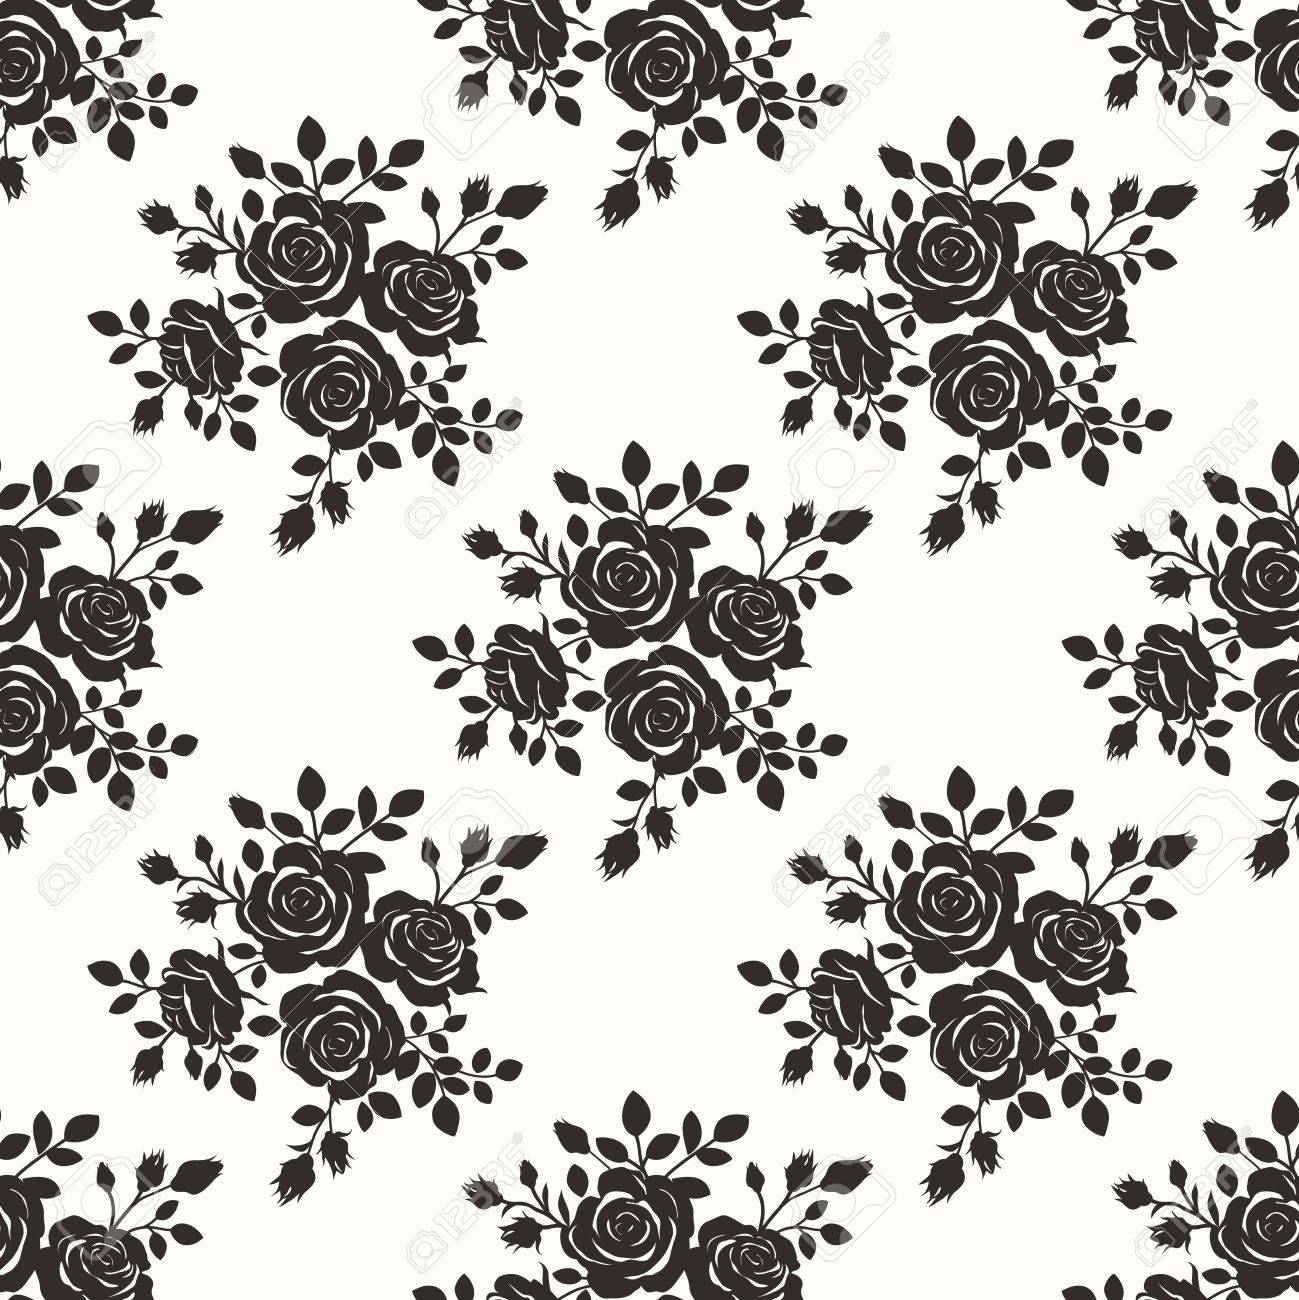 Vector Seamless Repeating Monochrome Black Color Vintage Rose Pattern Illustration Background - 57253197